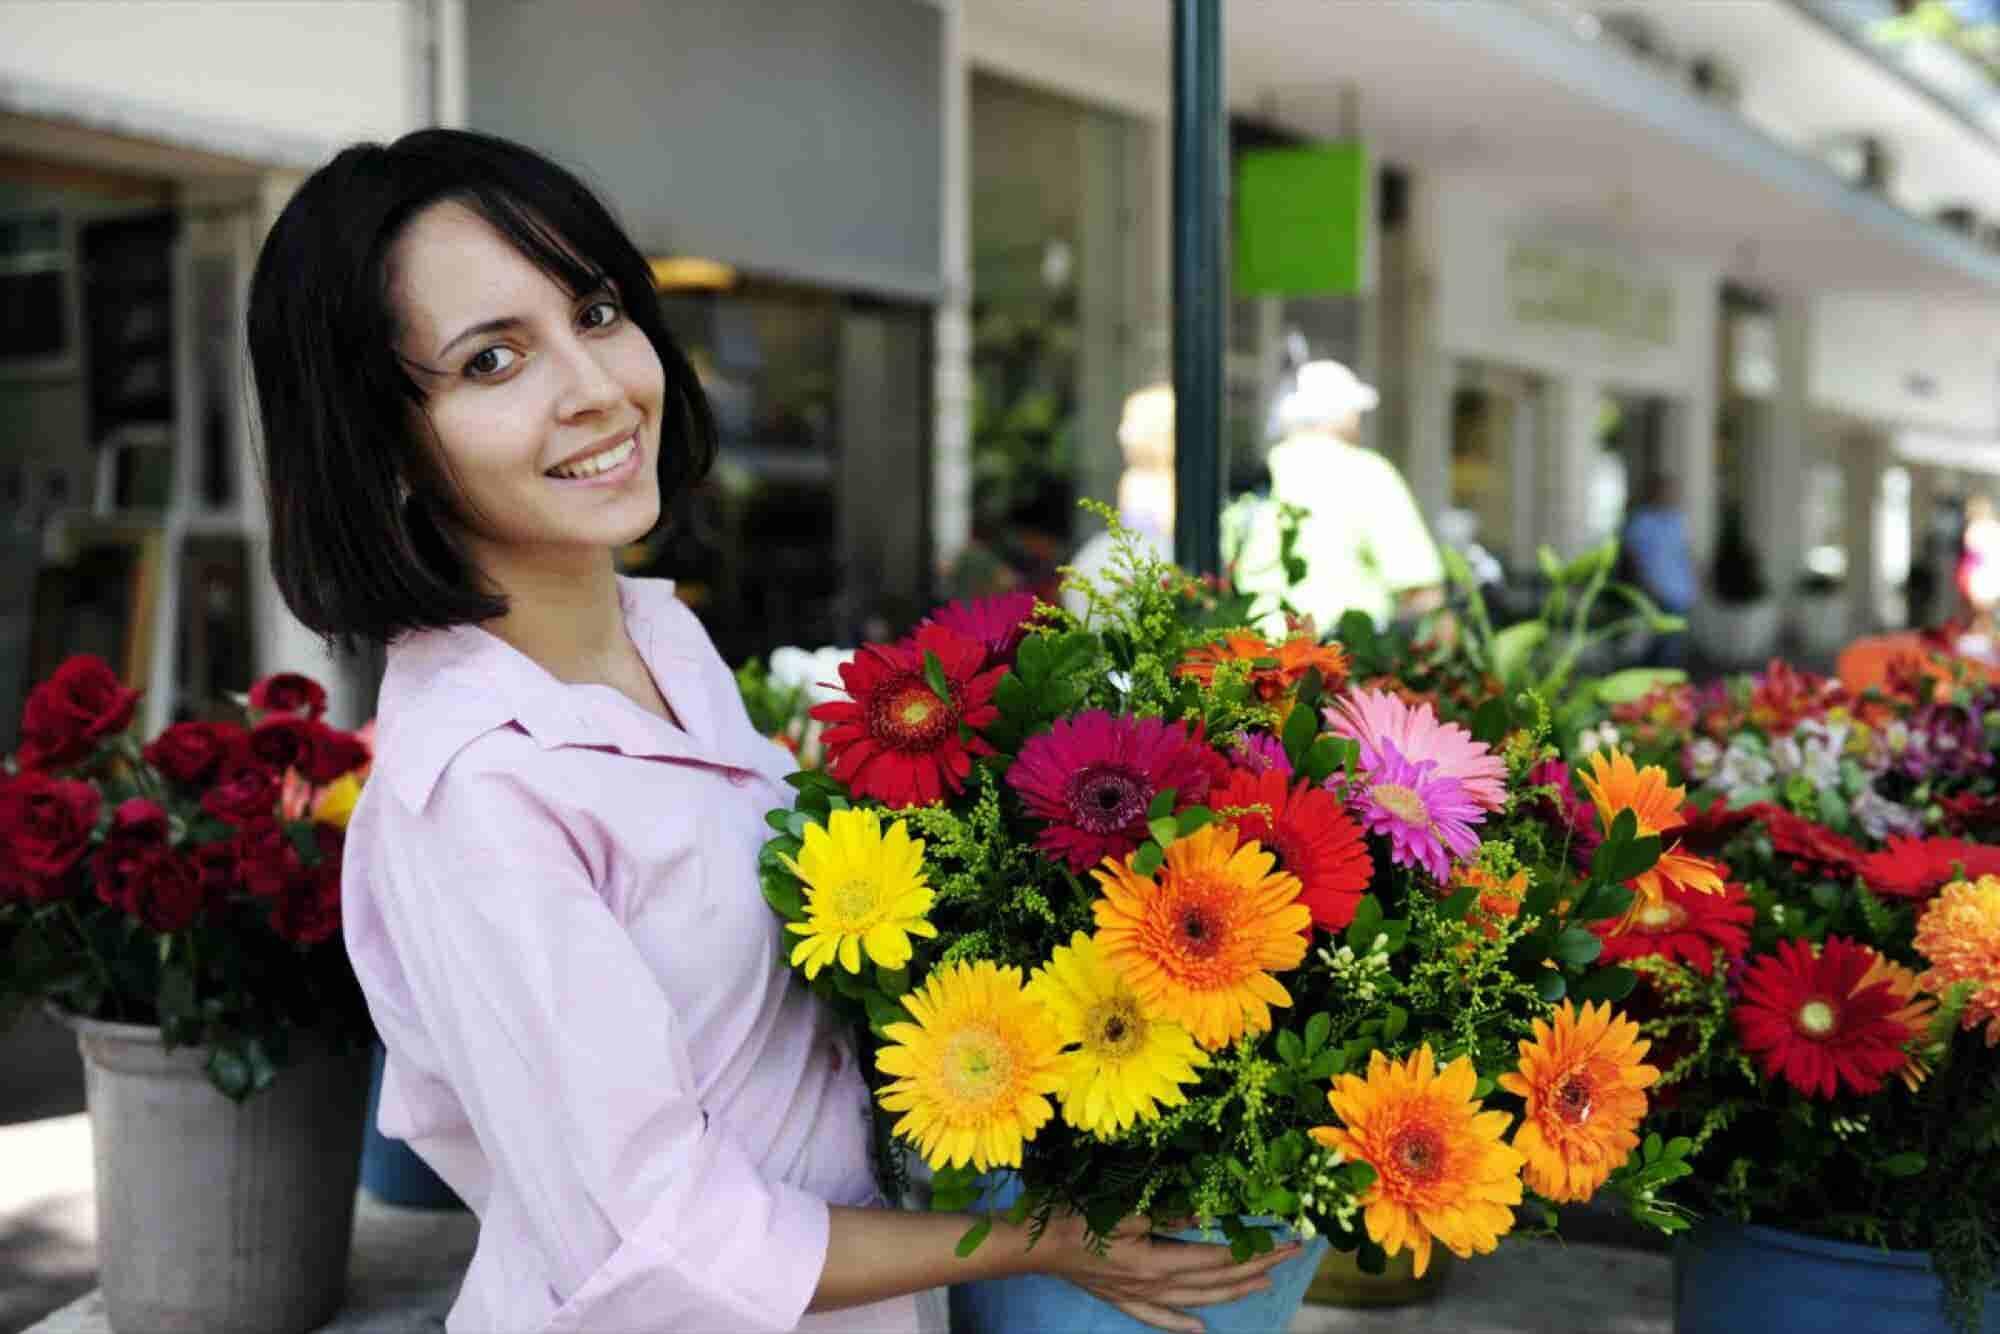 Cinco tips de empoderamiento para emprendedoras